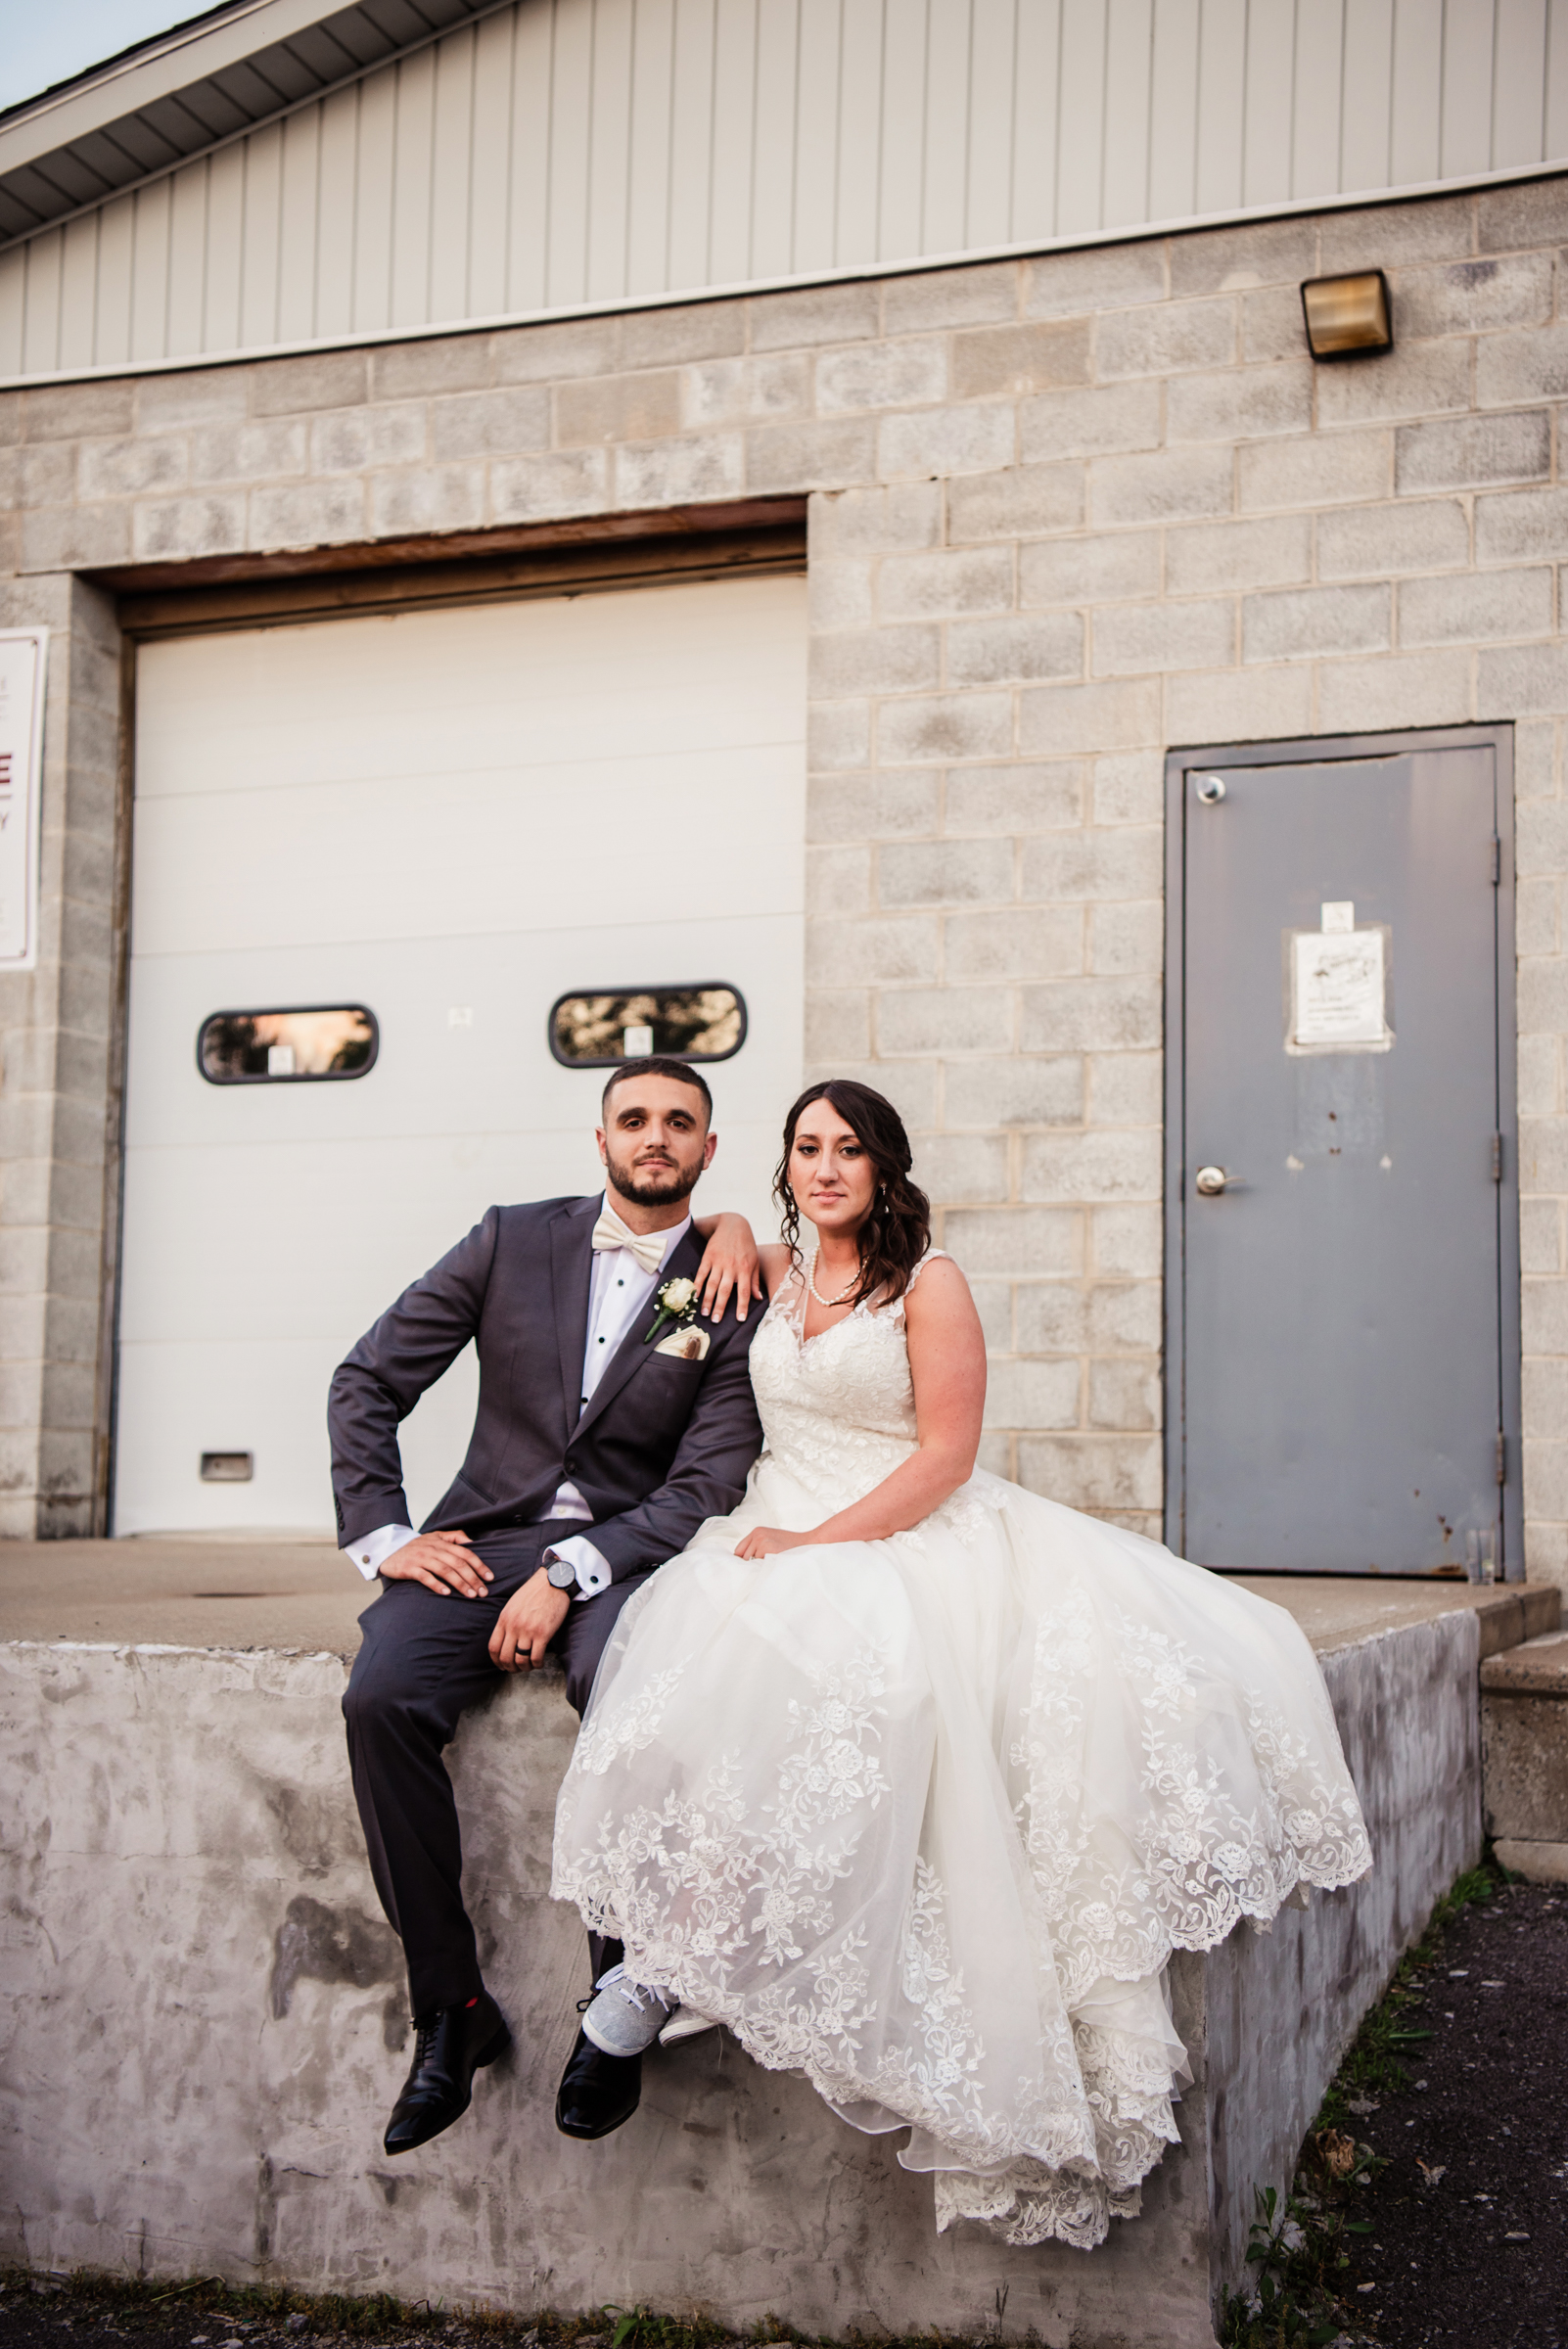 Historic_Old_St_Johns_Church_Valentinos_Banquet_Hall_Central_NY_Wedding_JILL_STUDIO_Rochester_NY_Photographer_DSC_6923.jpg